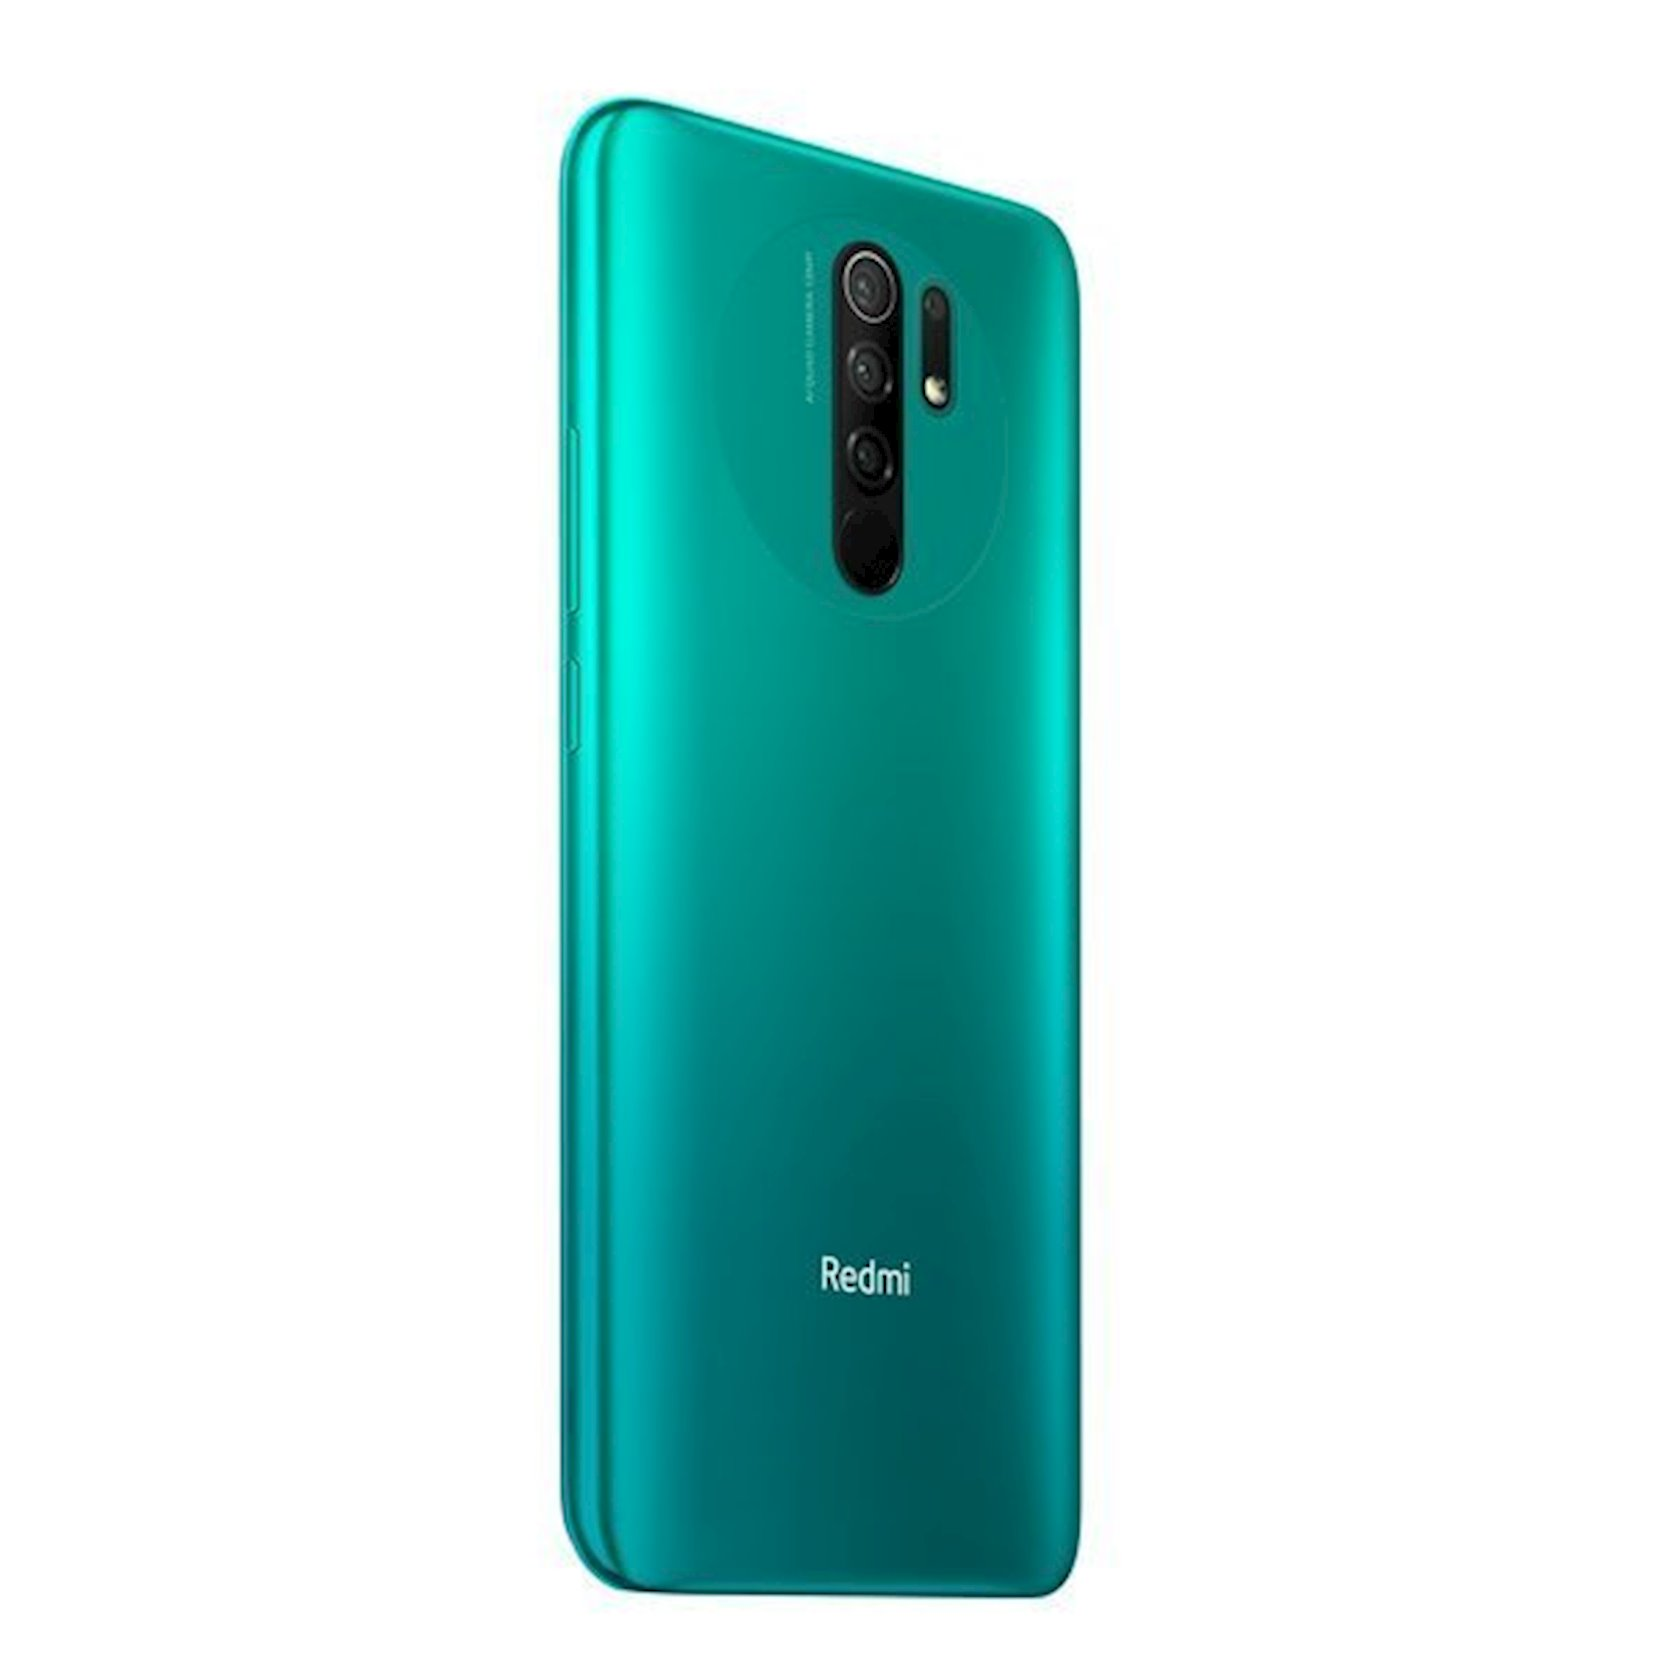 Smartfon Xiaomi Redmi 9 4GB/64GB Ocean Green